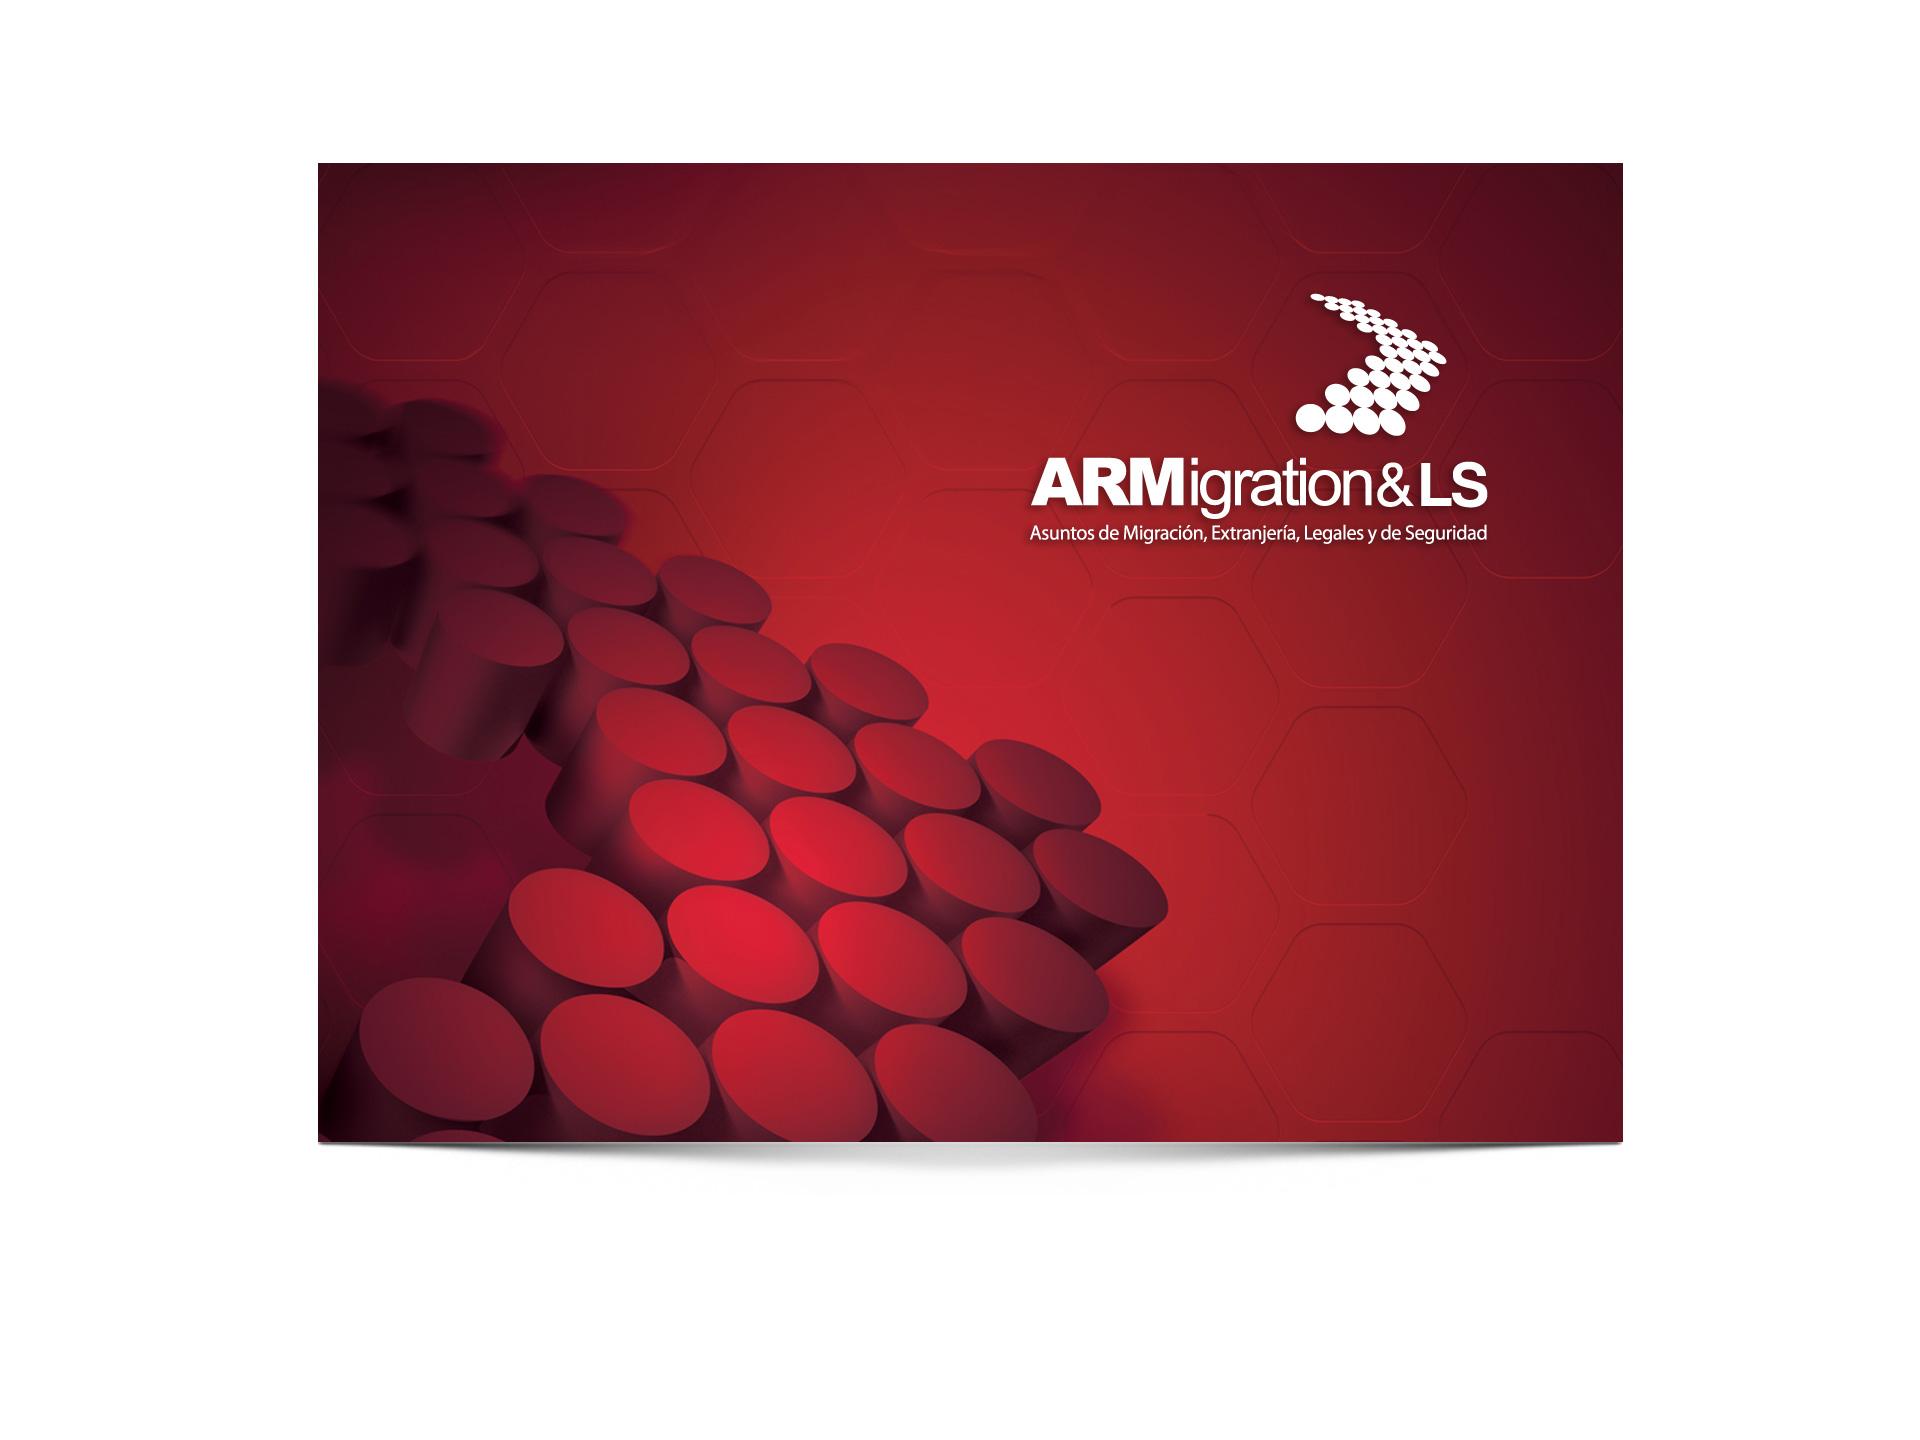 armigration